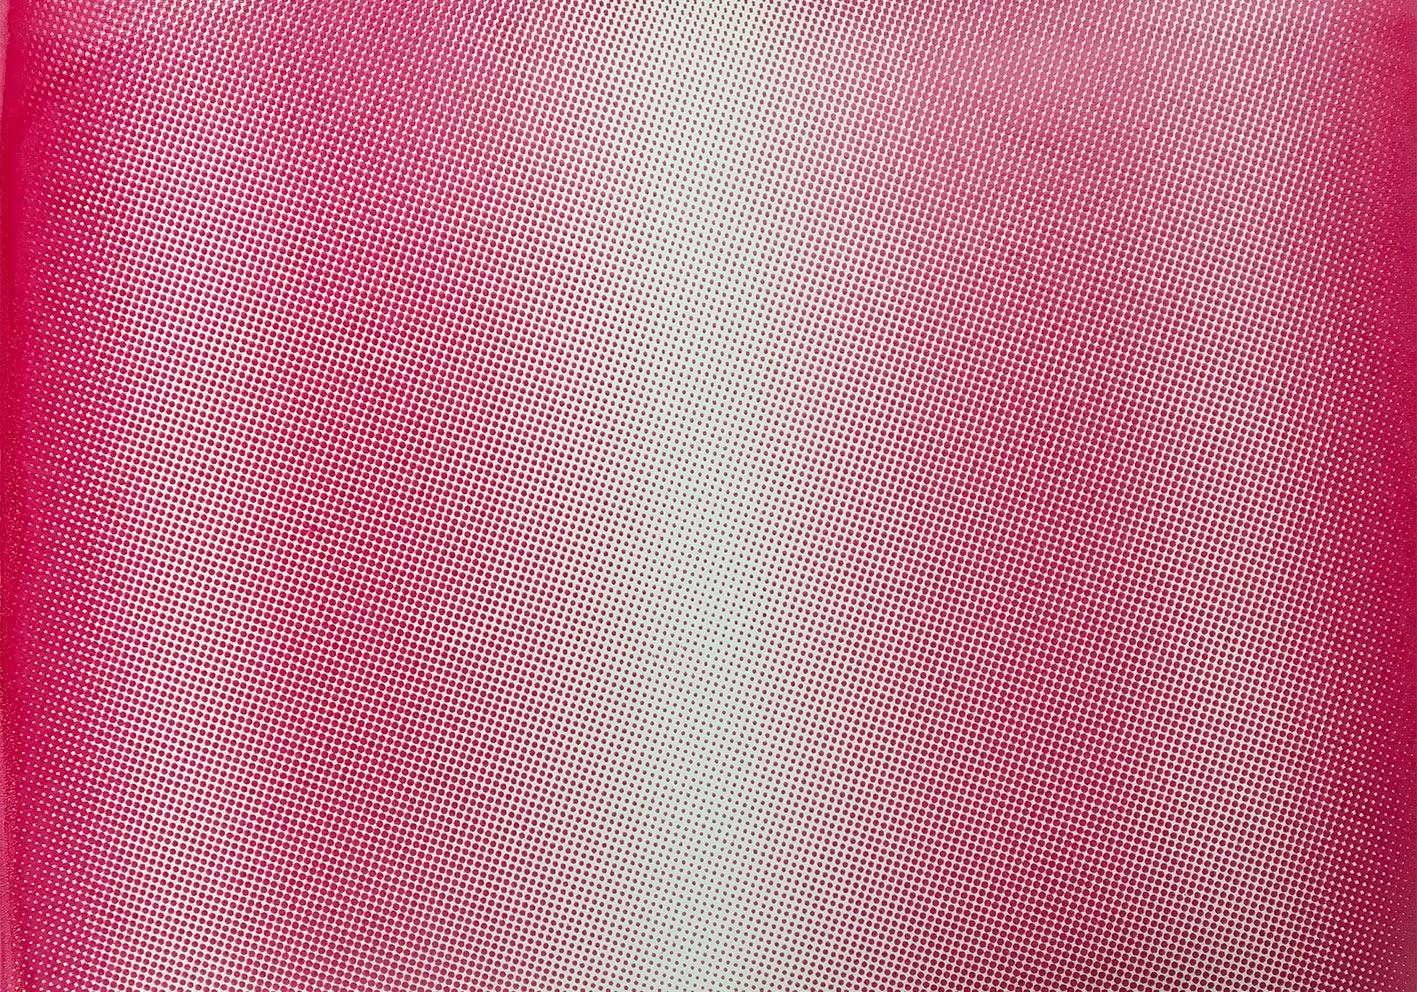 half_tone_gradient 0201w.jpg